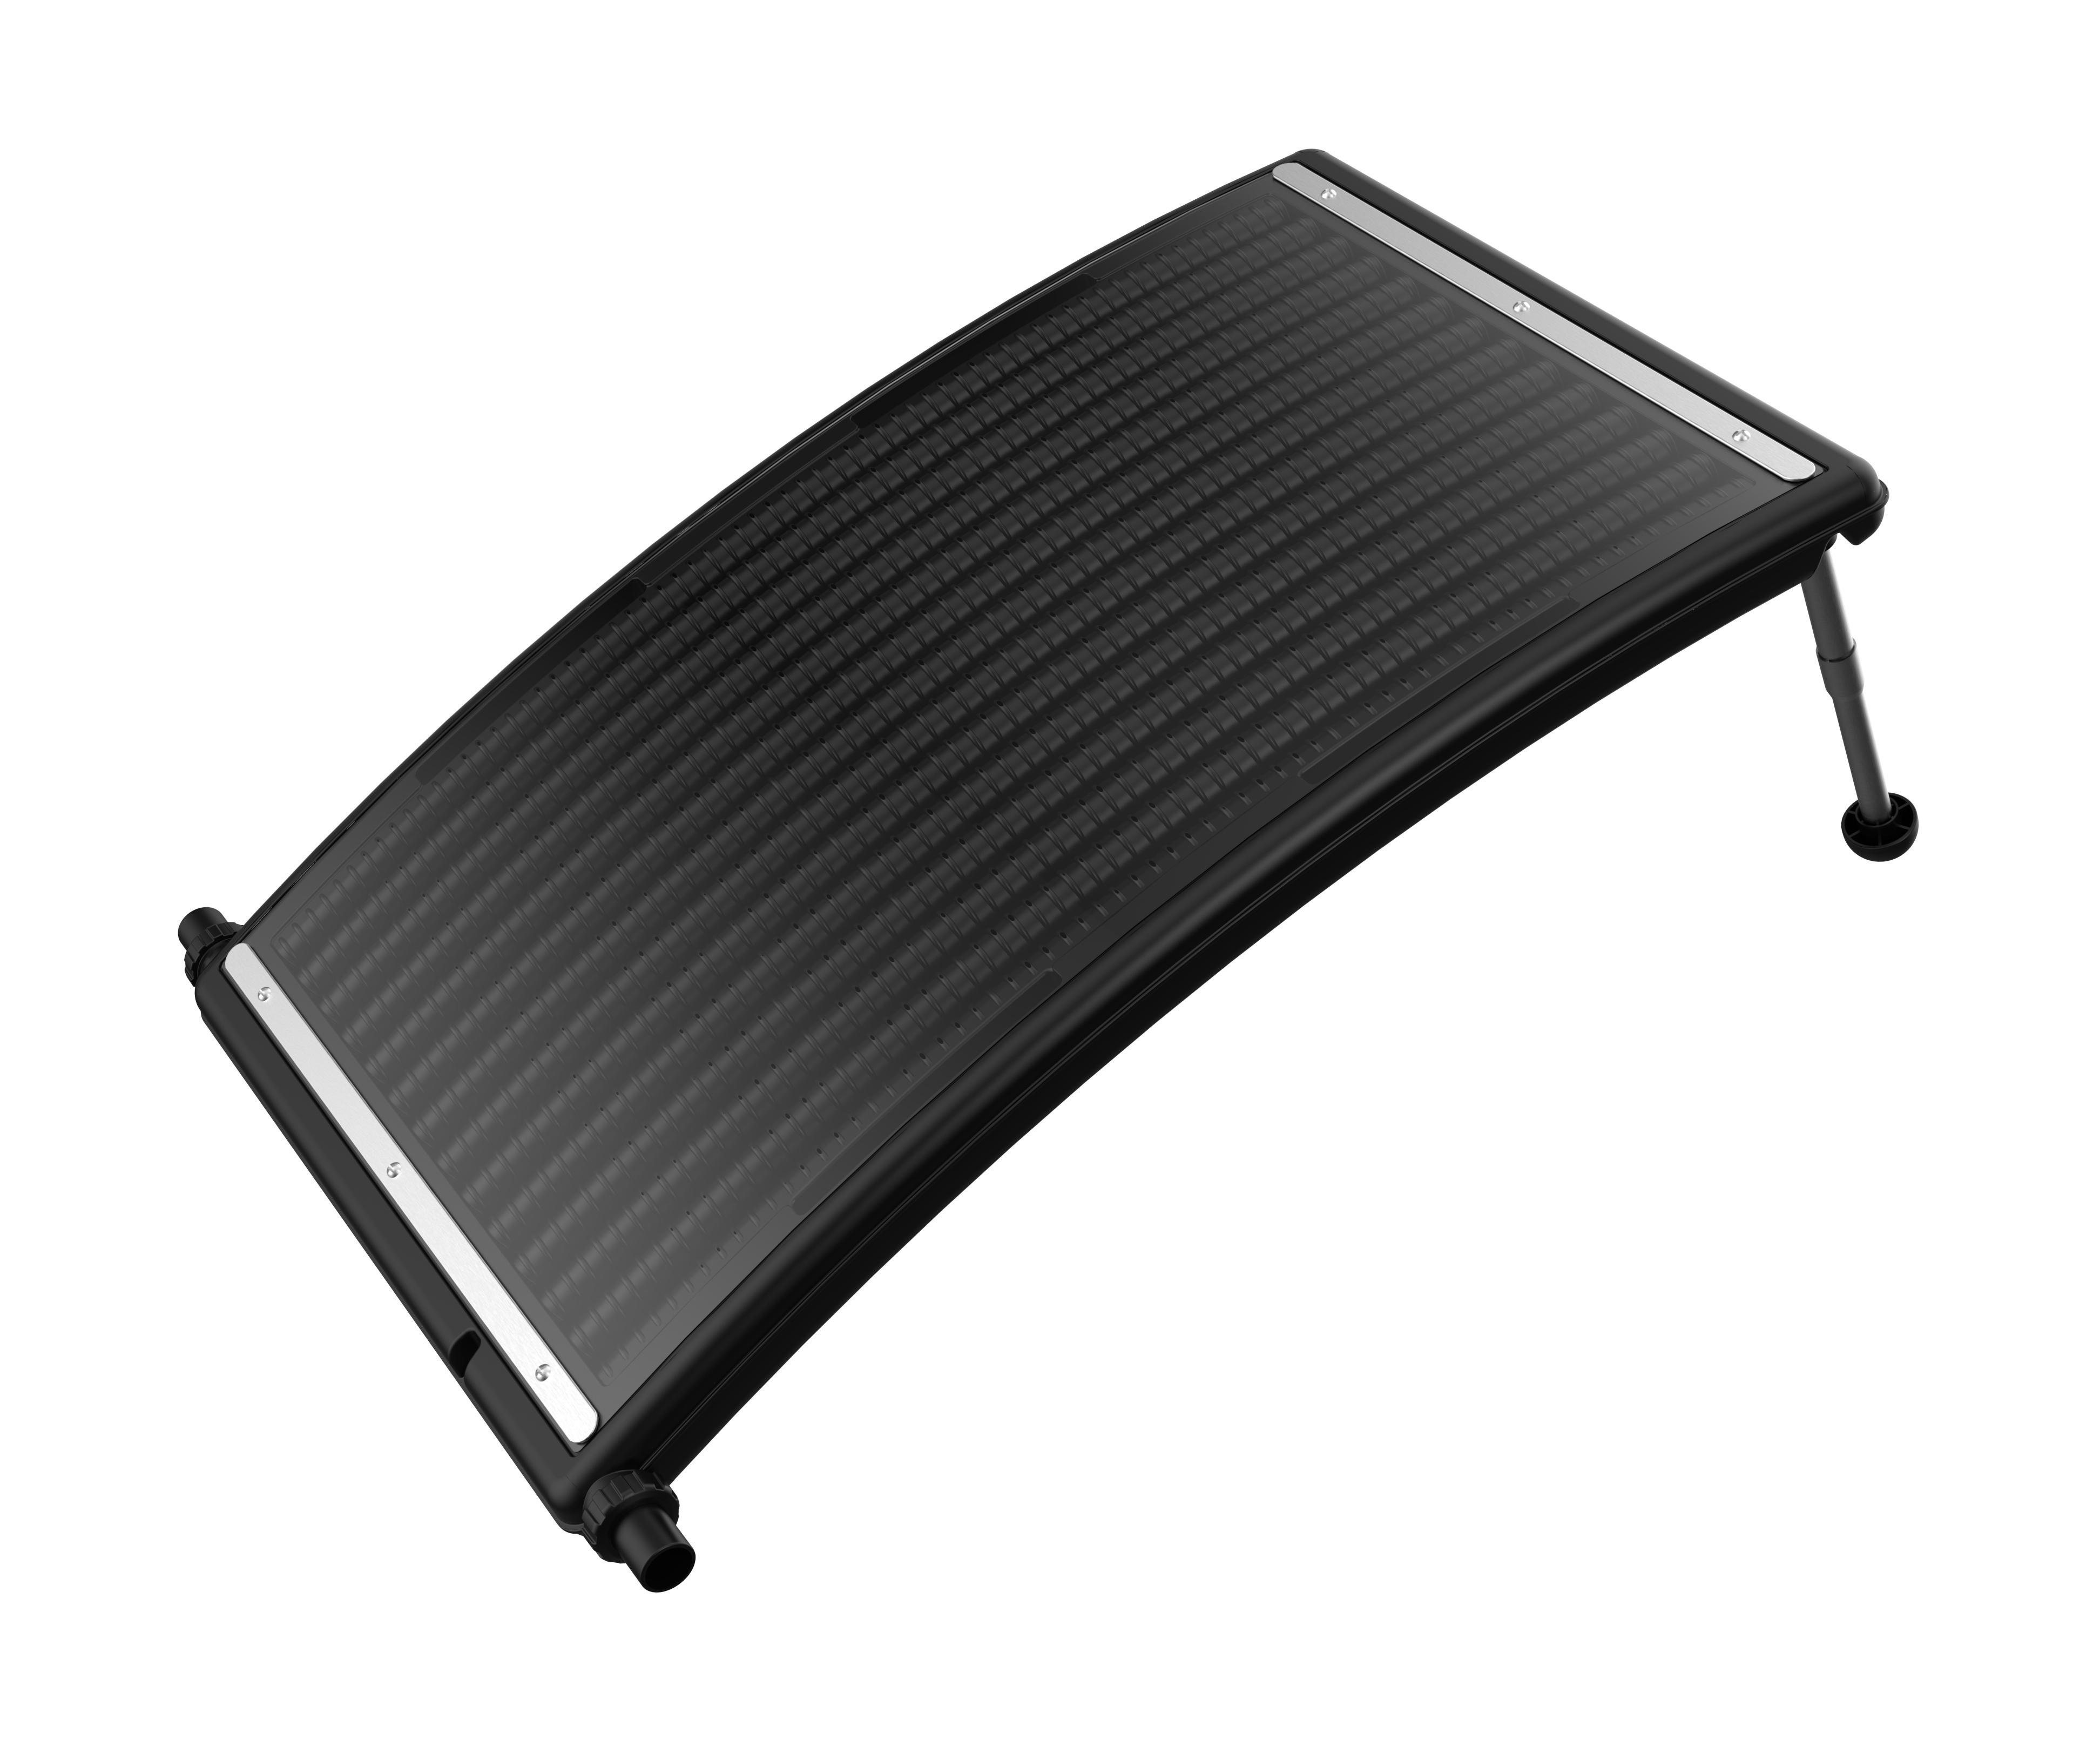 Solarboard curve Swim & Fun